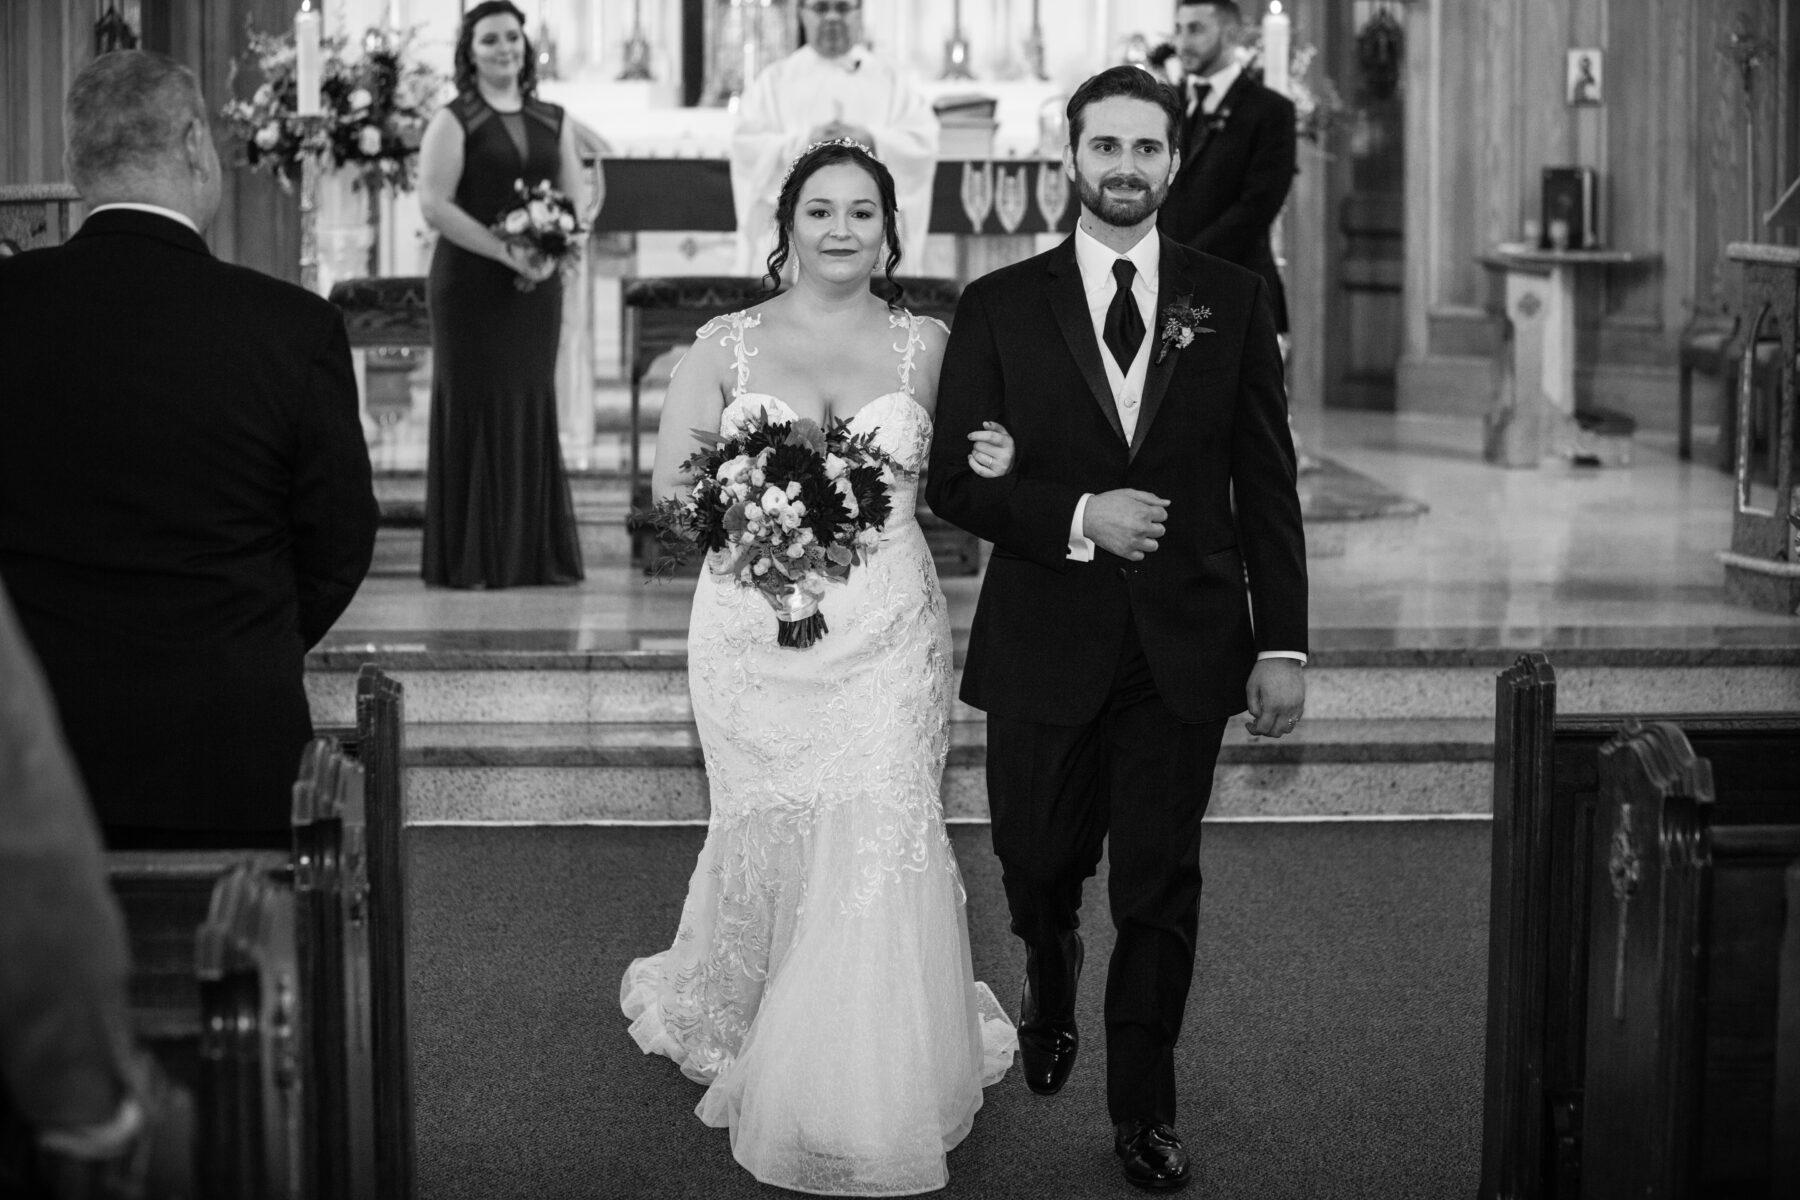 Rhodes on the Pawtuxet Cranston Wedding Carolyn and Tony Blueflash Photography 10